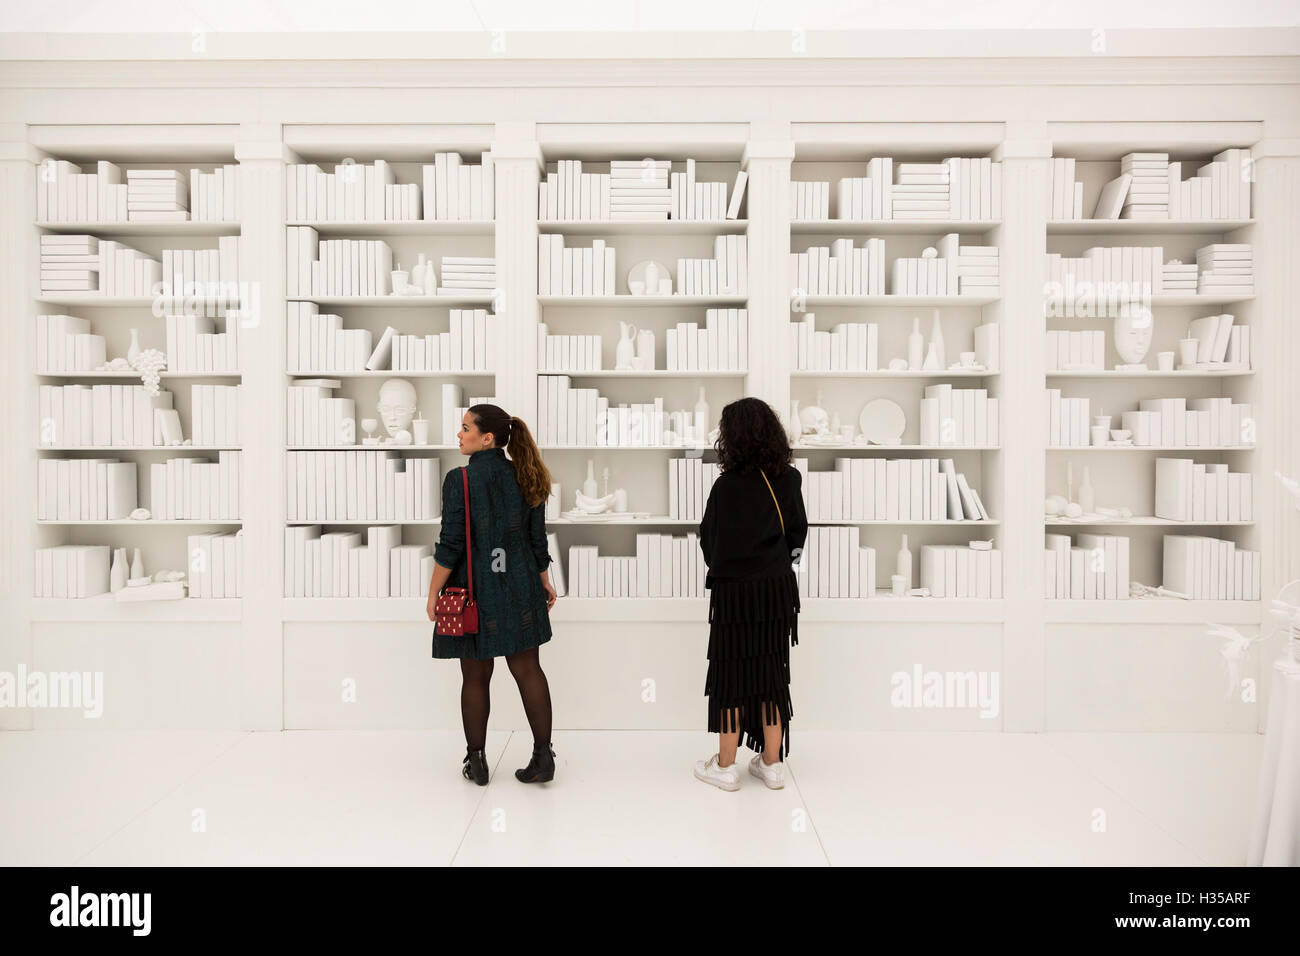 London, UK. 5 October 2016. Artworks by Belgian artist Hans Op de Beeck. Press preview day of the 2016 Frieze Art - Stock Image